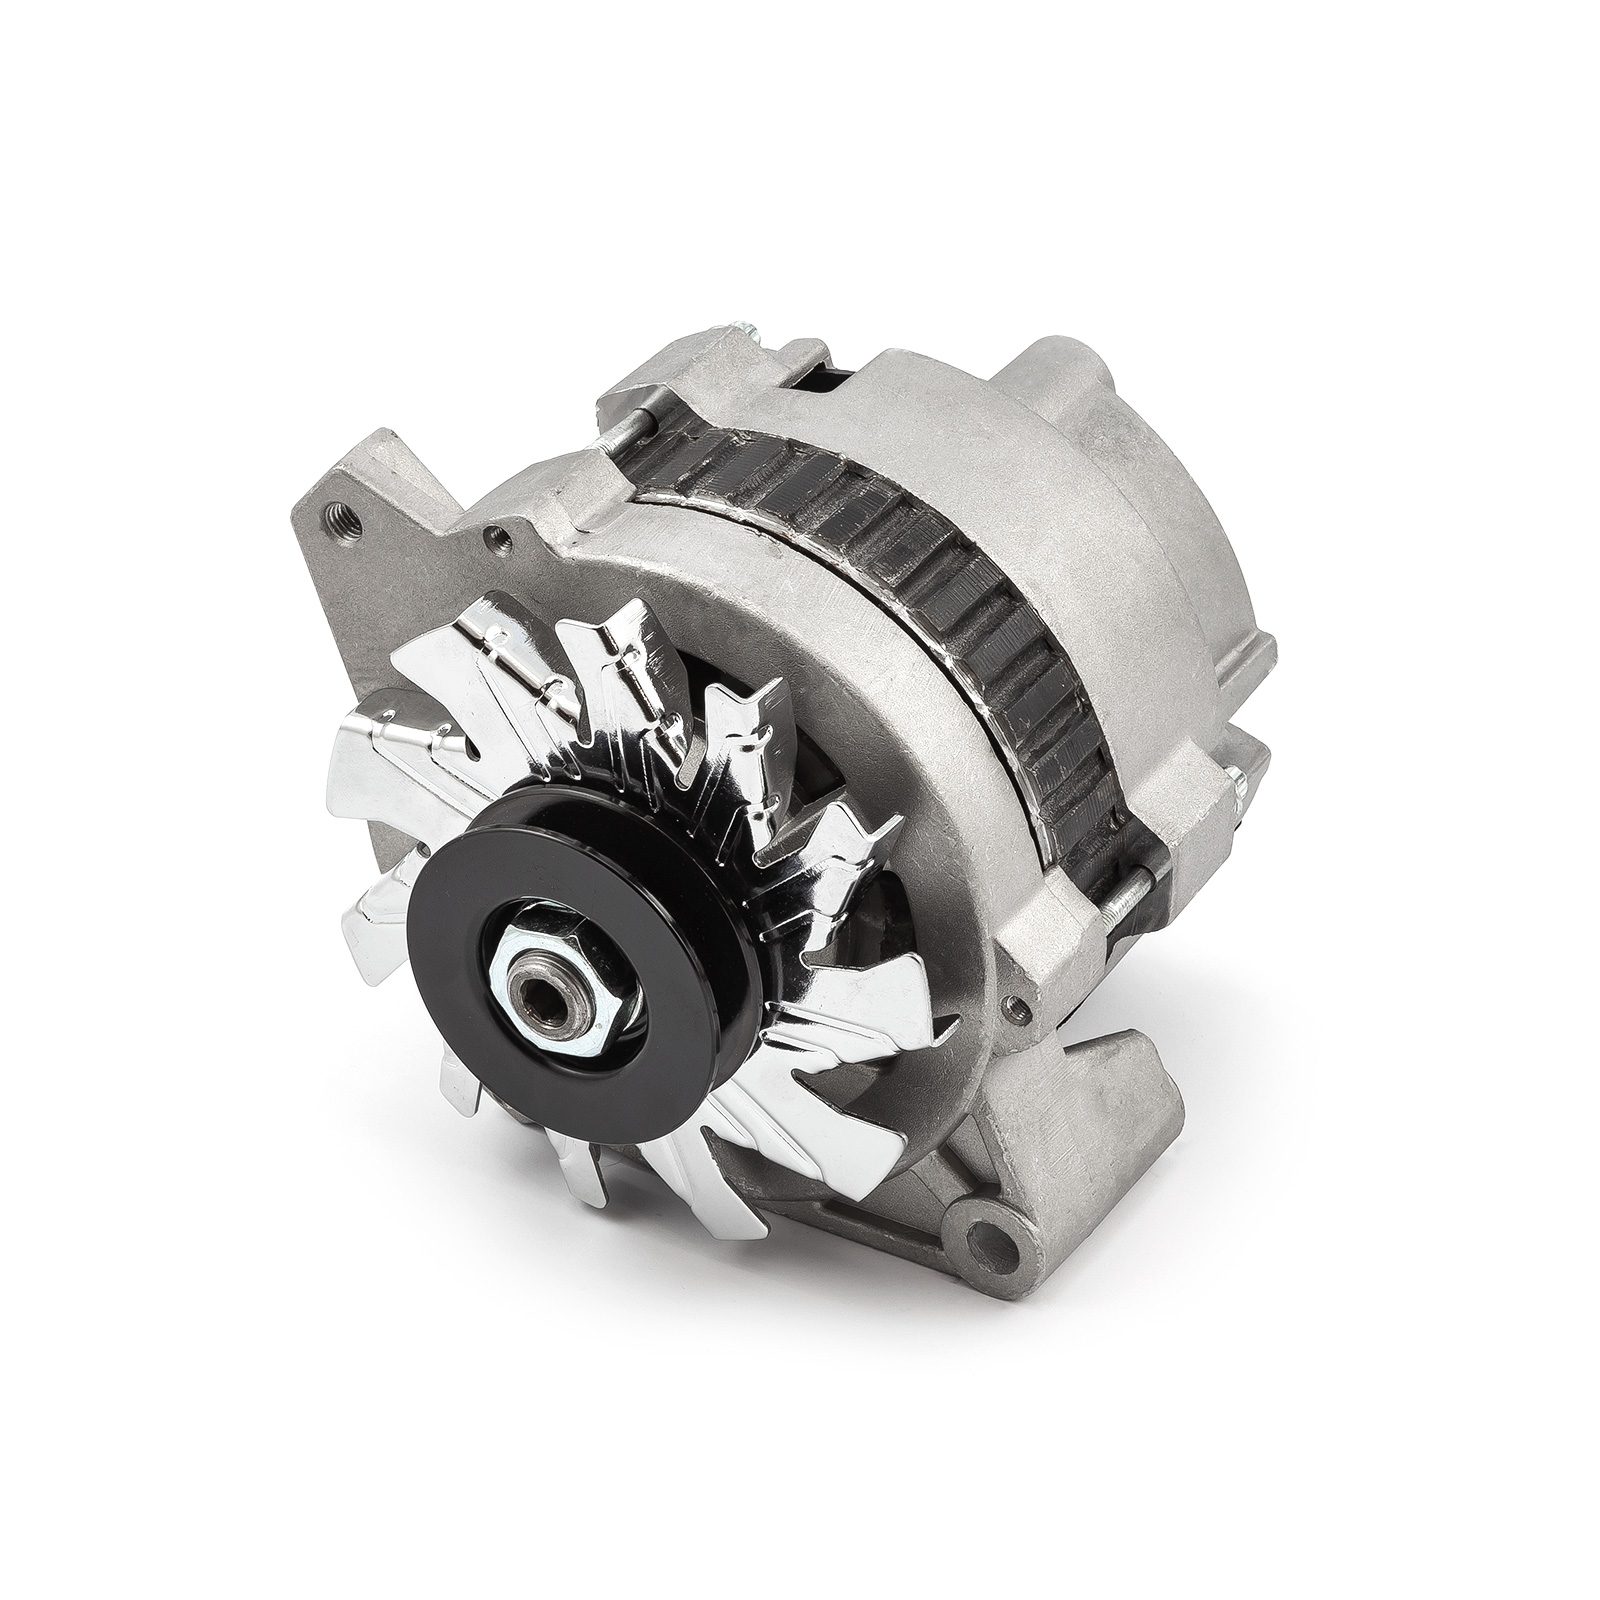 Universal Serpentine 80 Amp High Output CS130 Alternator